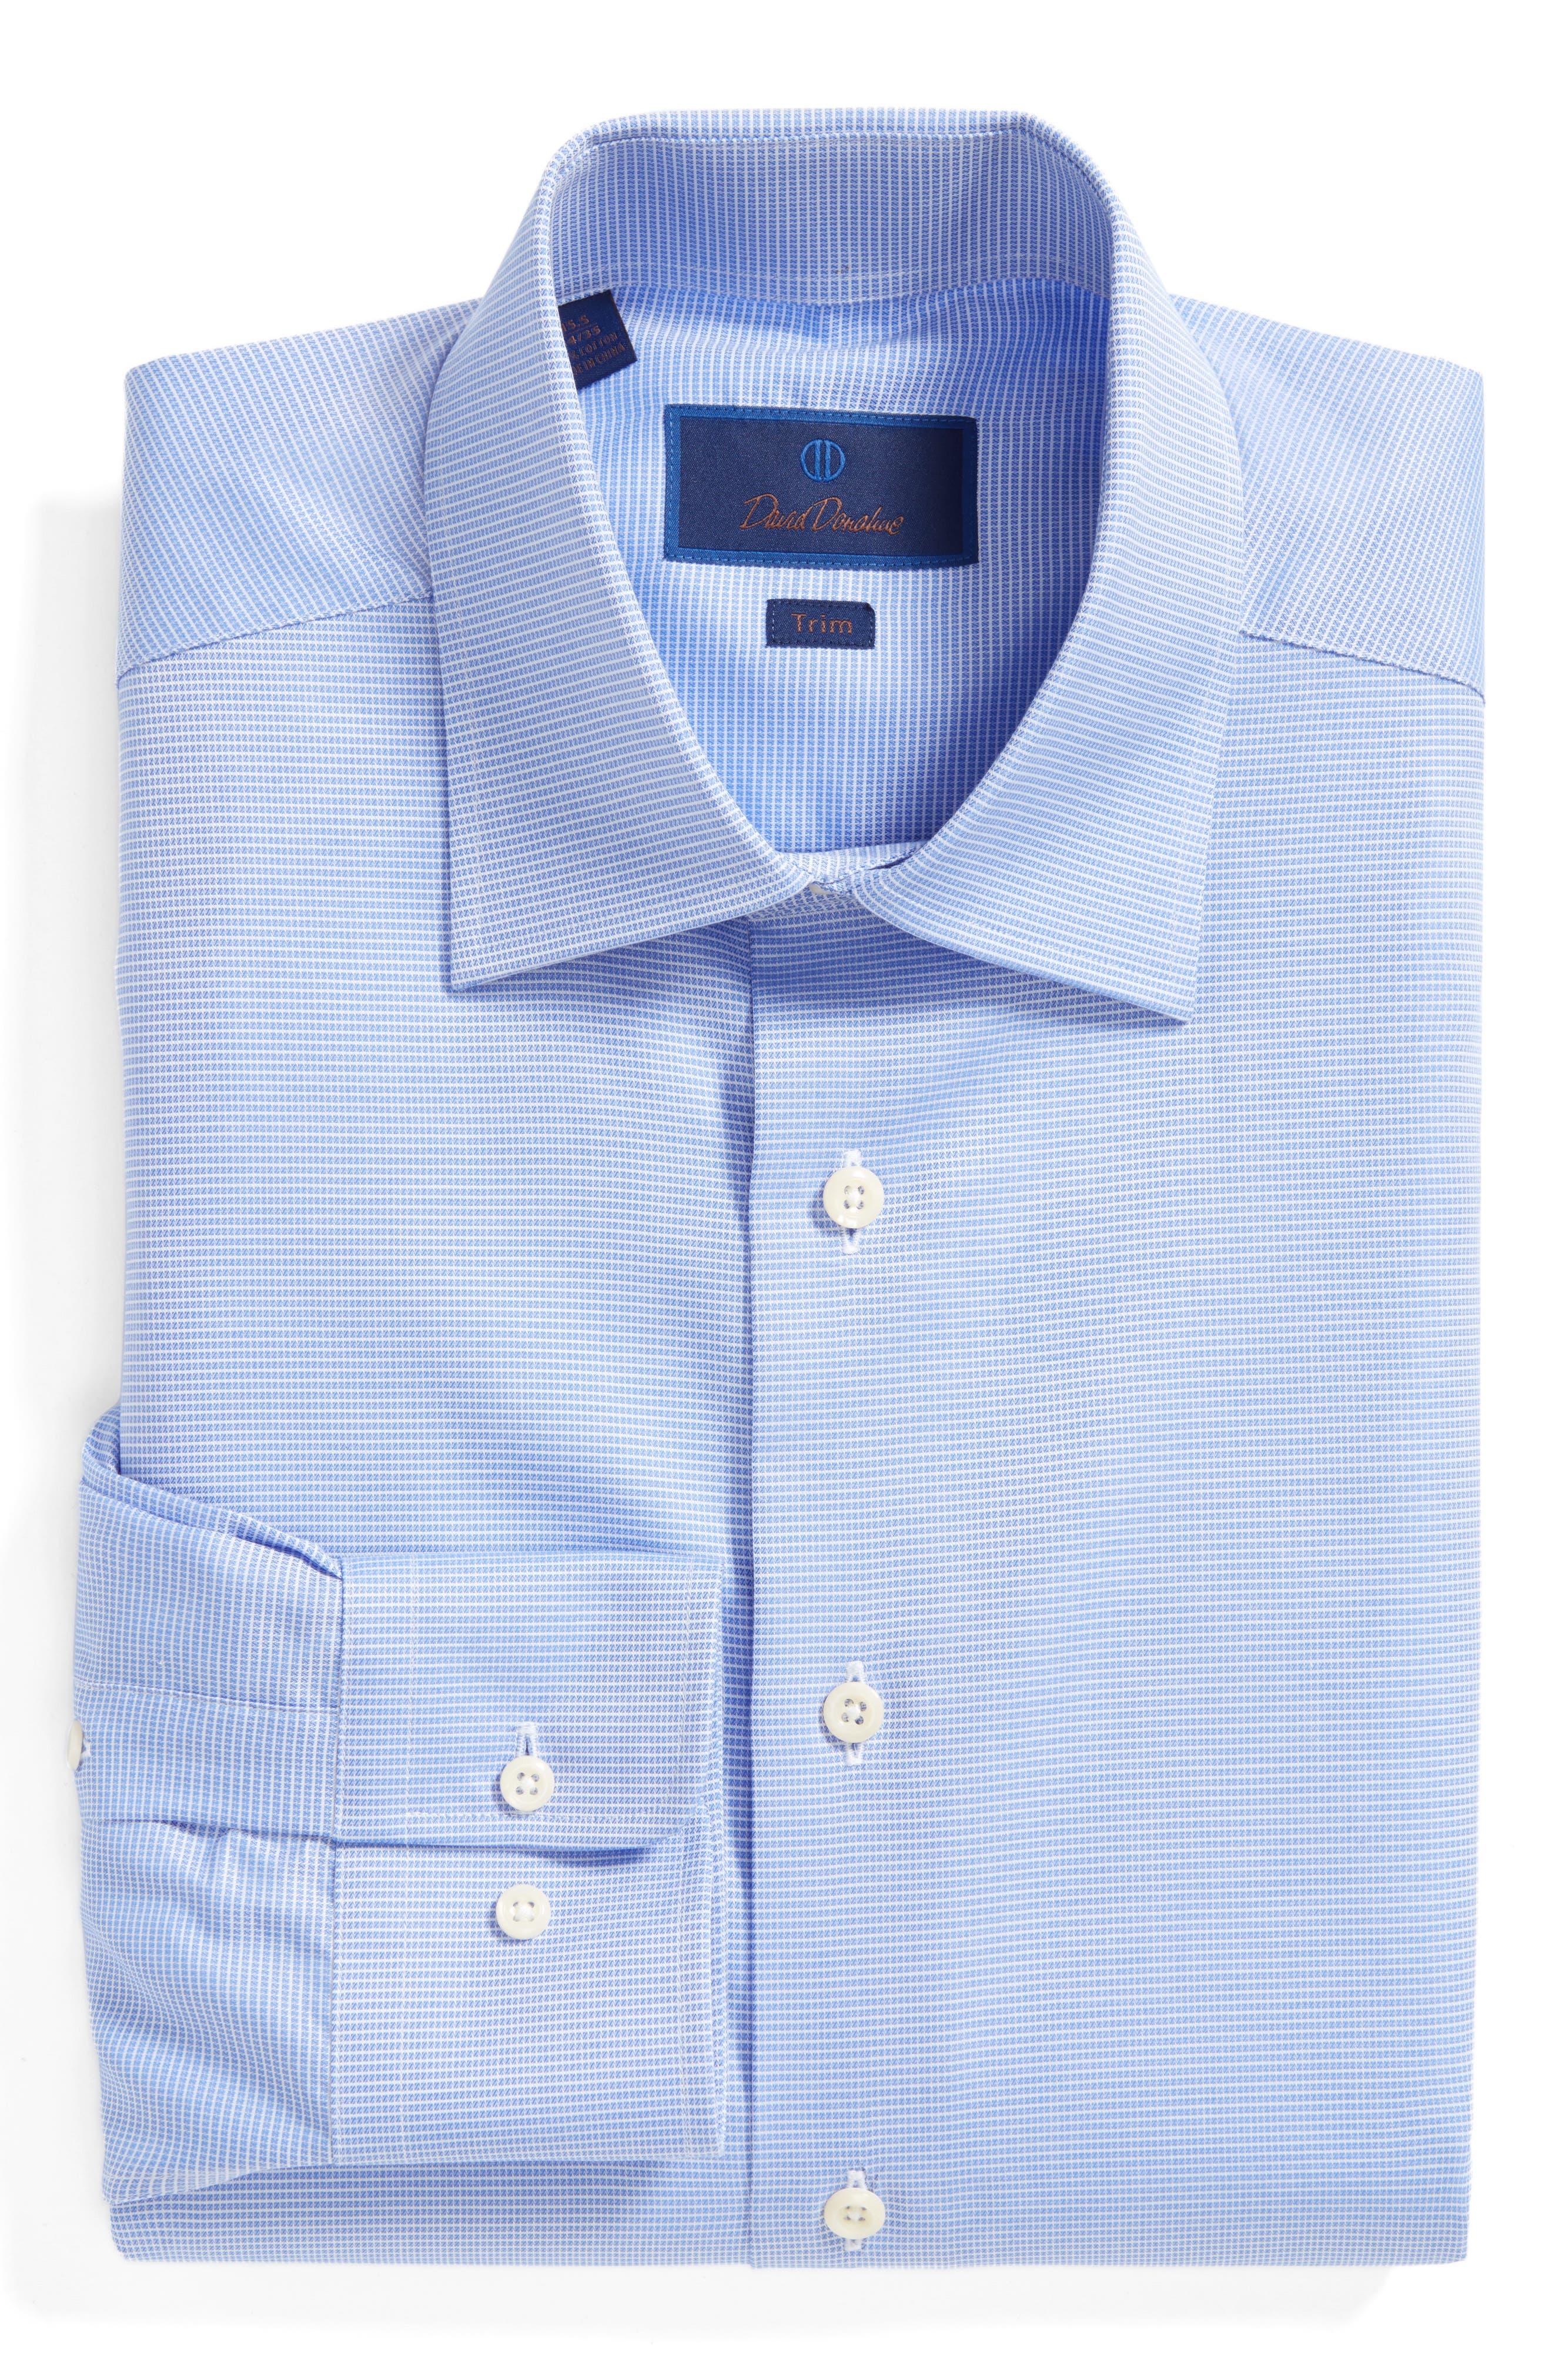 Alternate Image 1 Selected - David Donahue Trim Fit Microcheck Dress Shirt